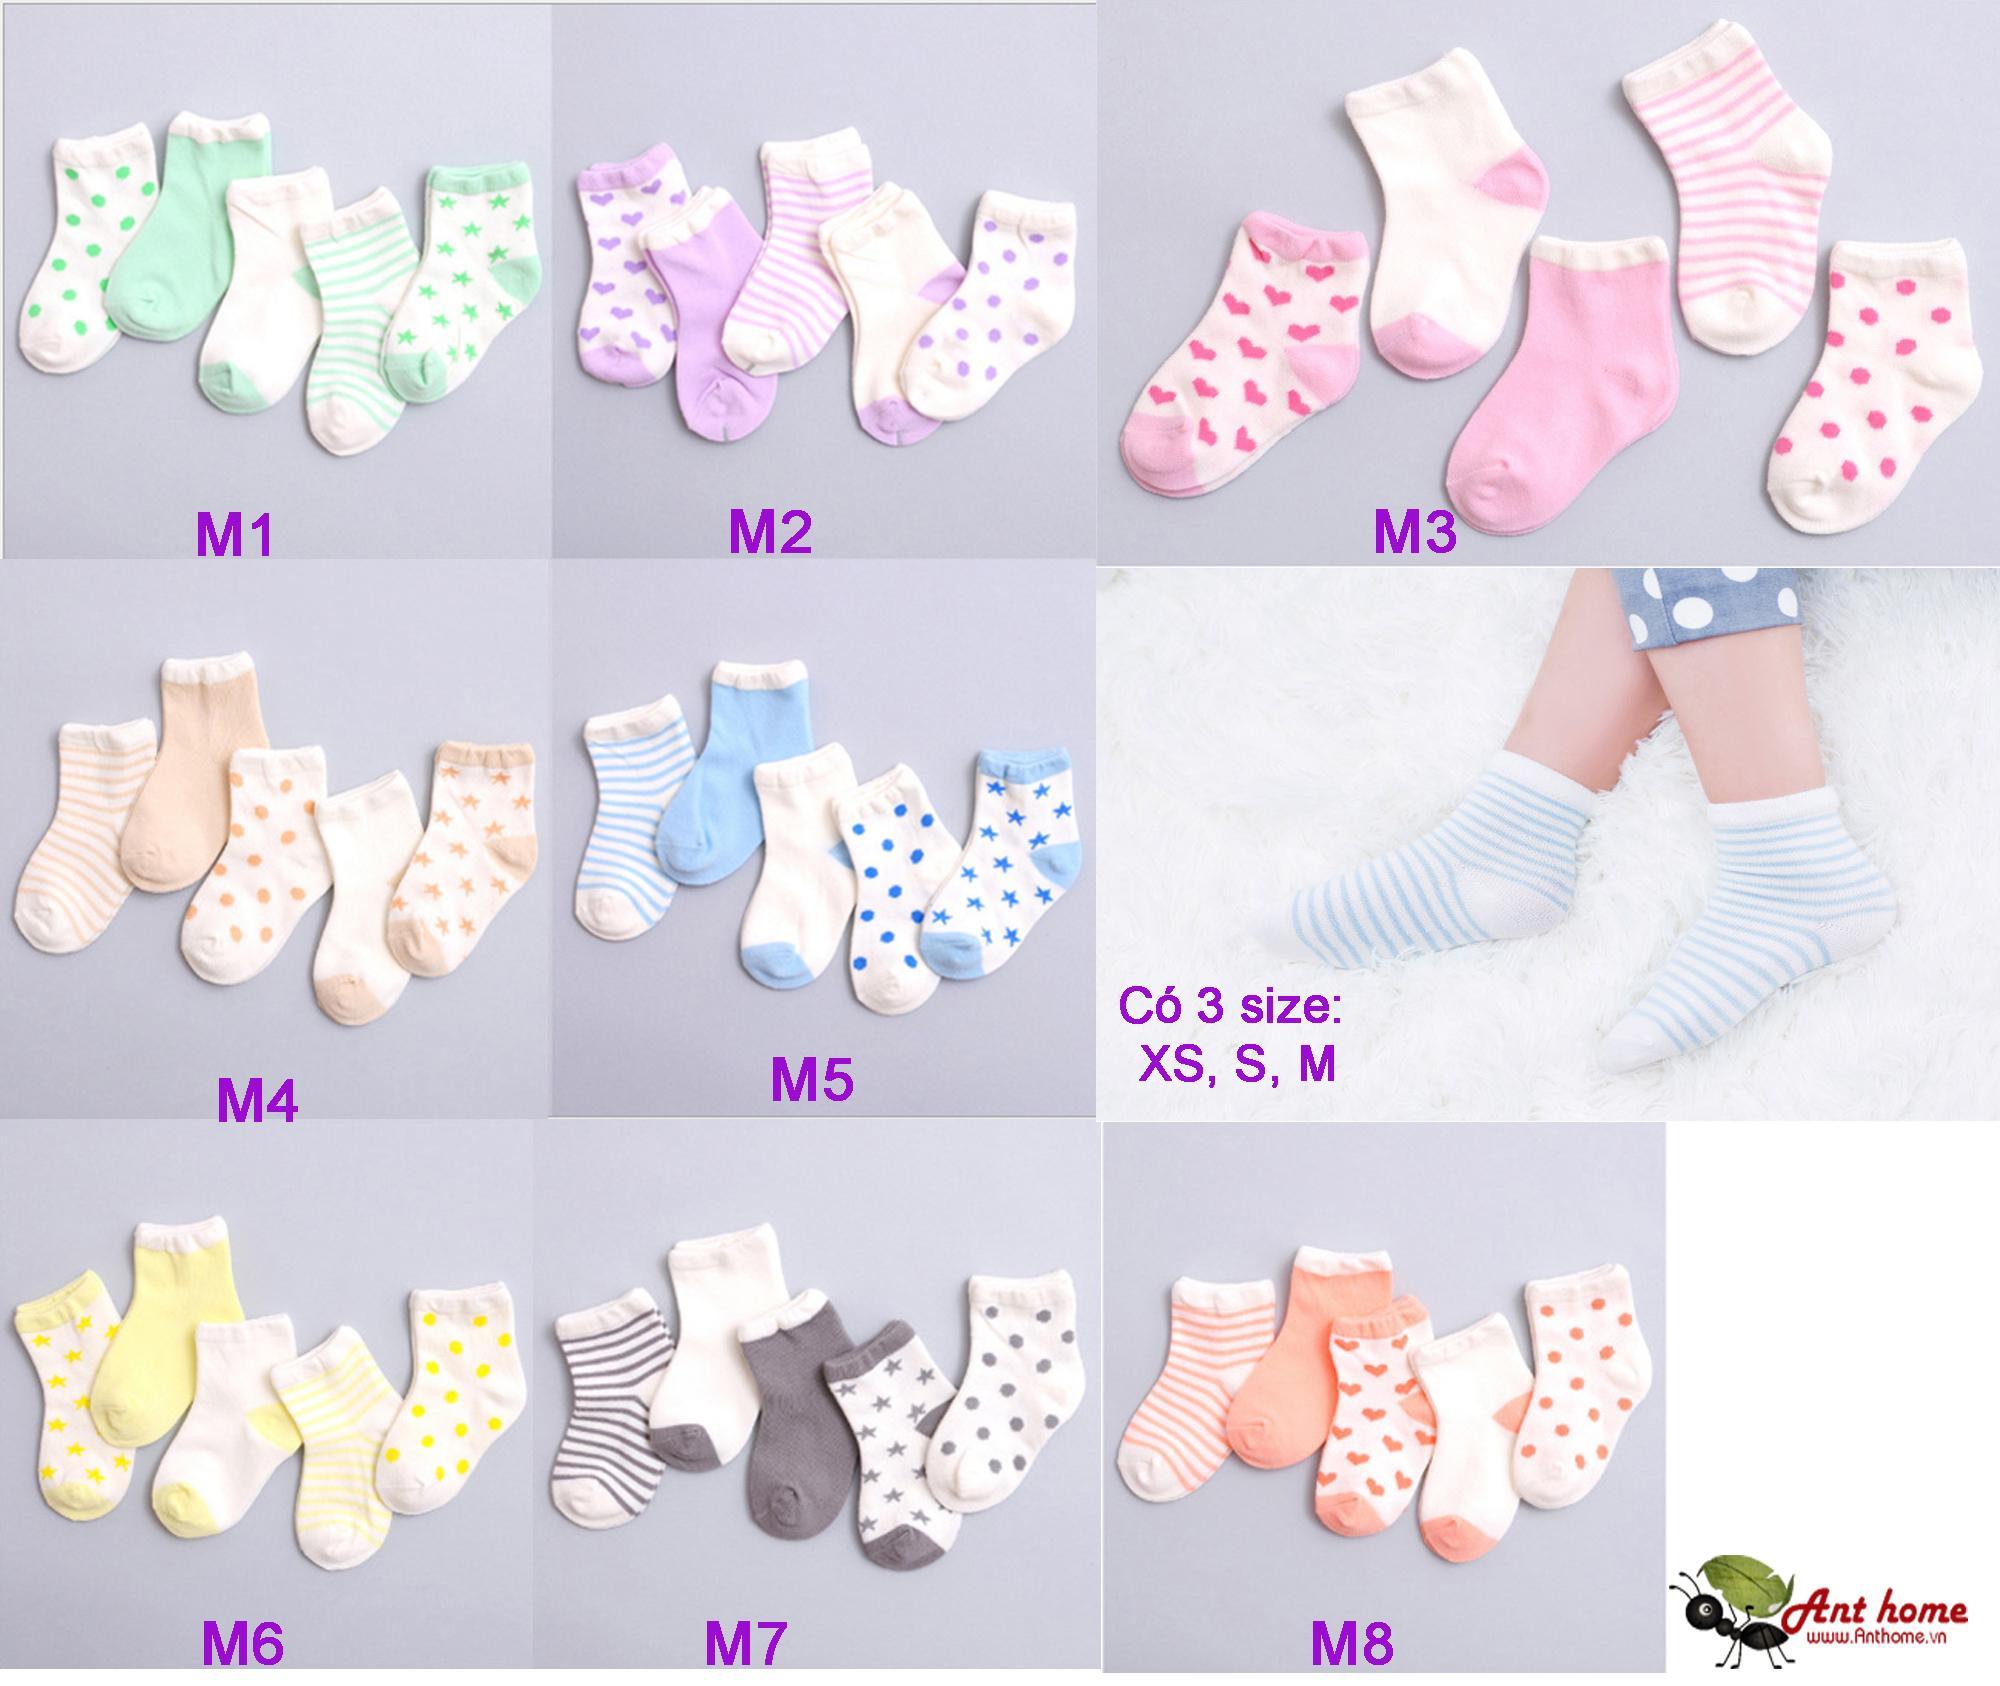 Combo 5 đôi vớ (tất) bé gái từ 0-1 tuổi size XS mẫu M6